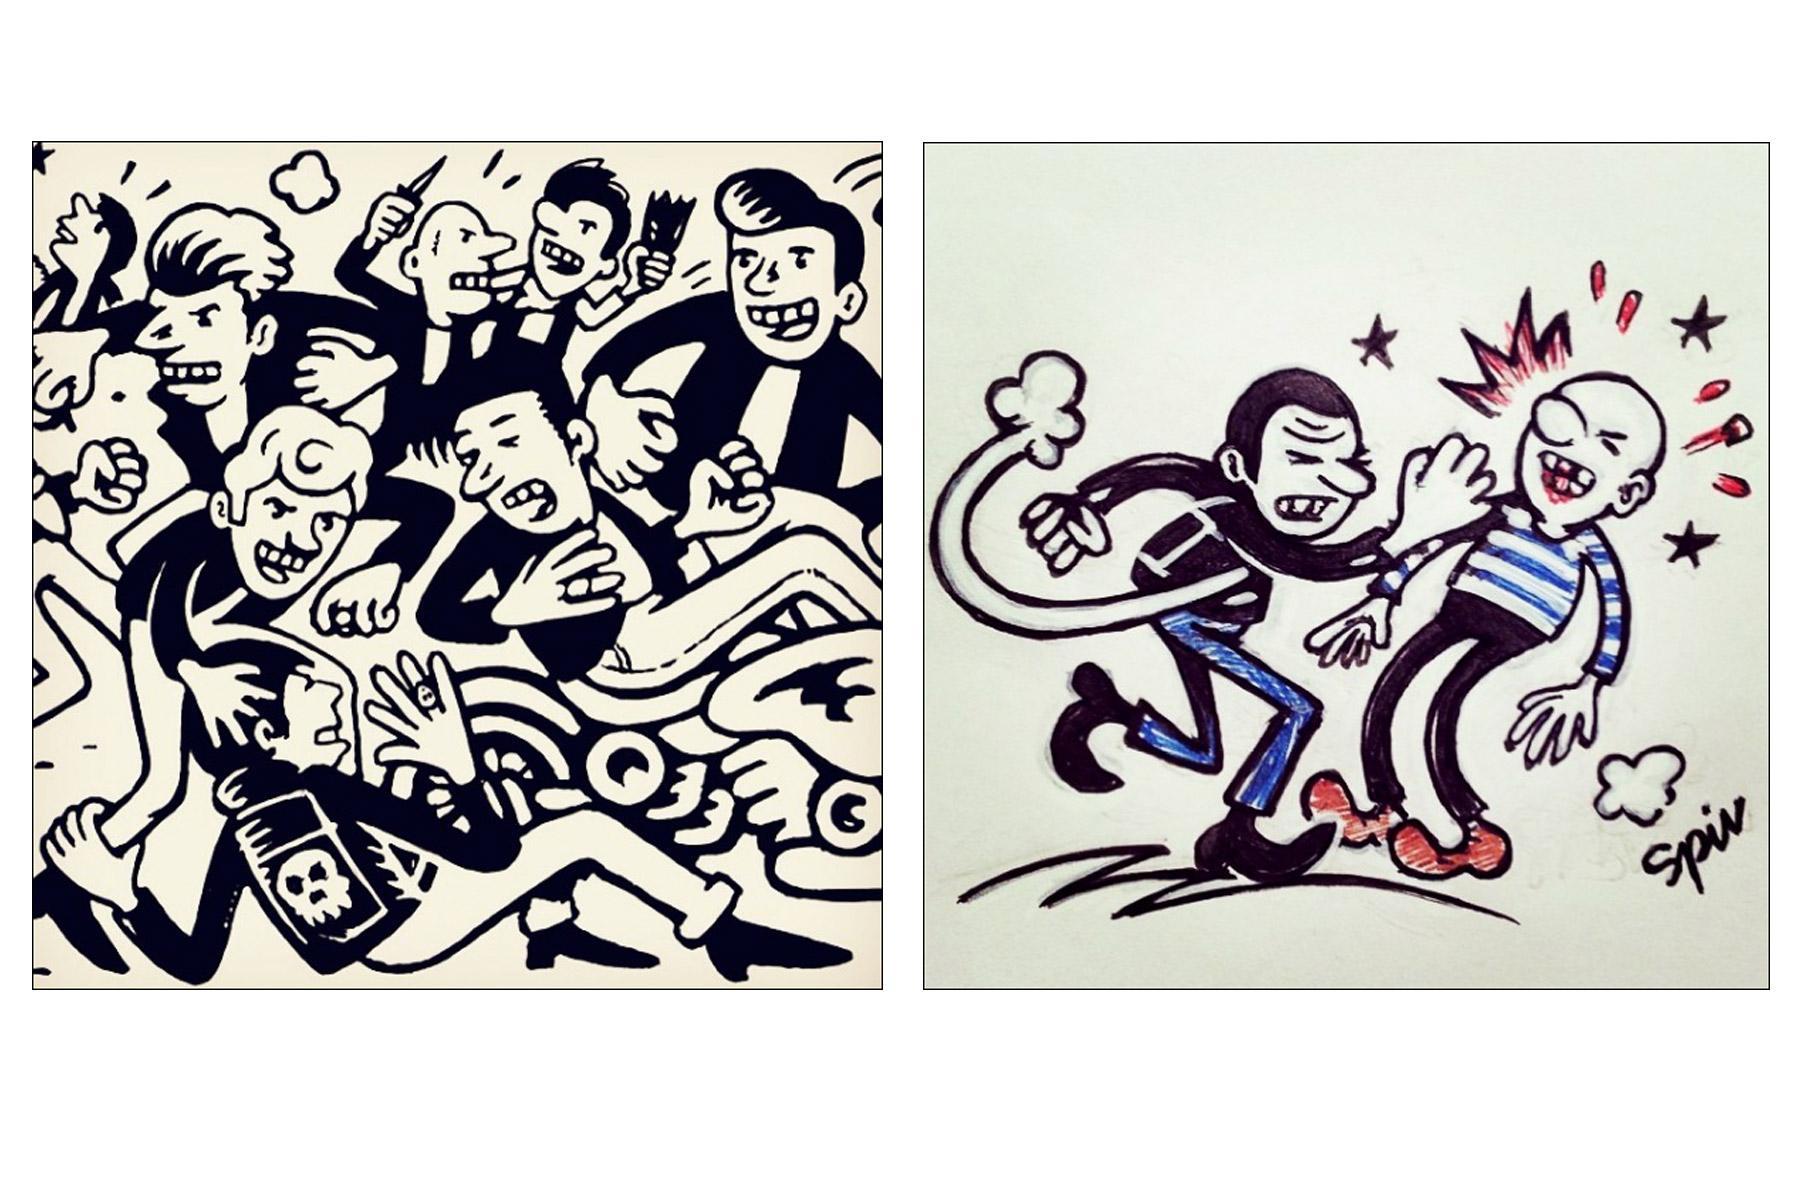 Drawings of men fighting by artist Avi Spivak. Ponyboy magazine.